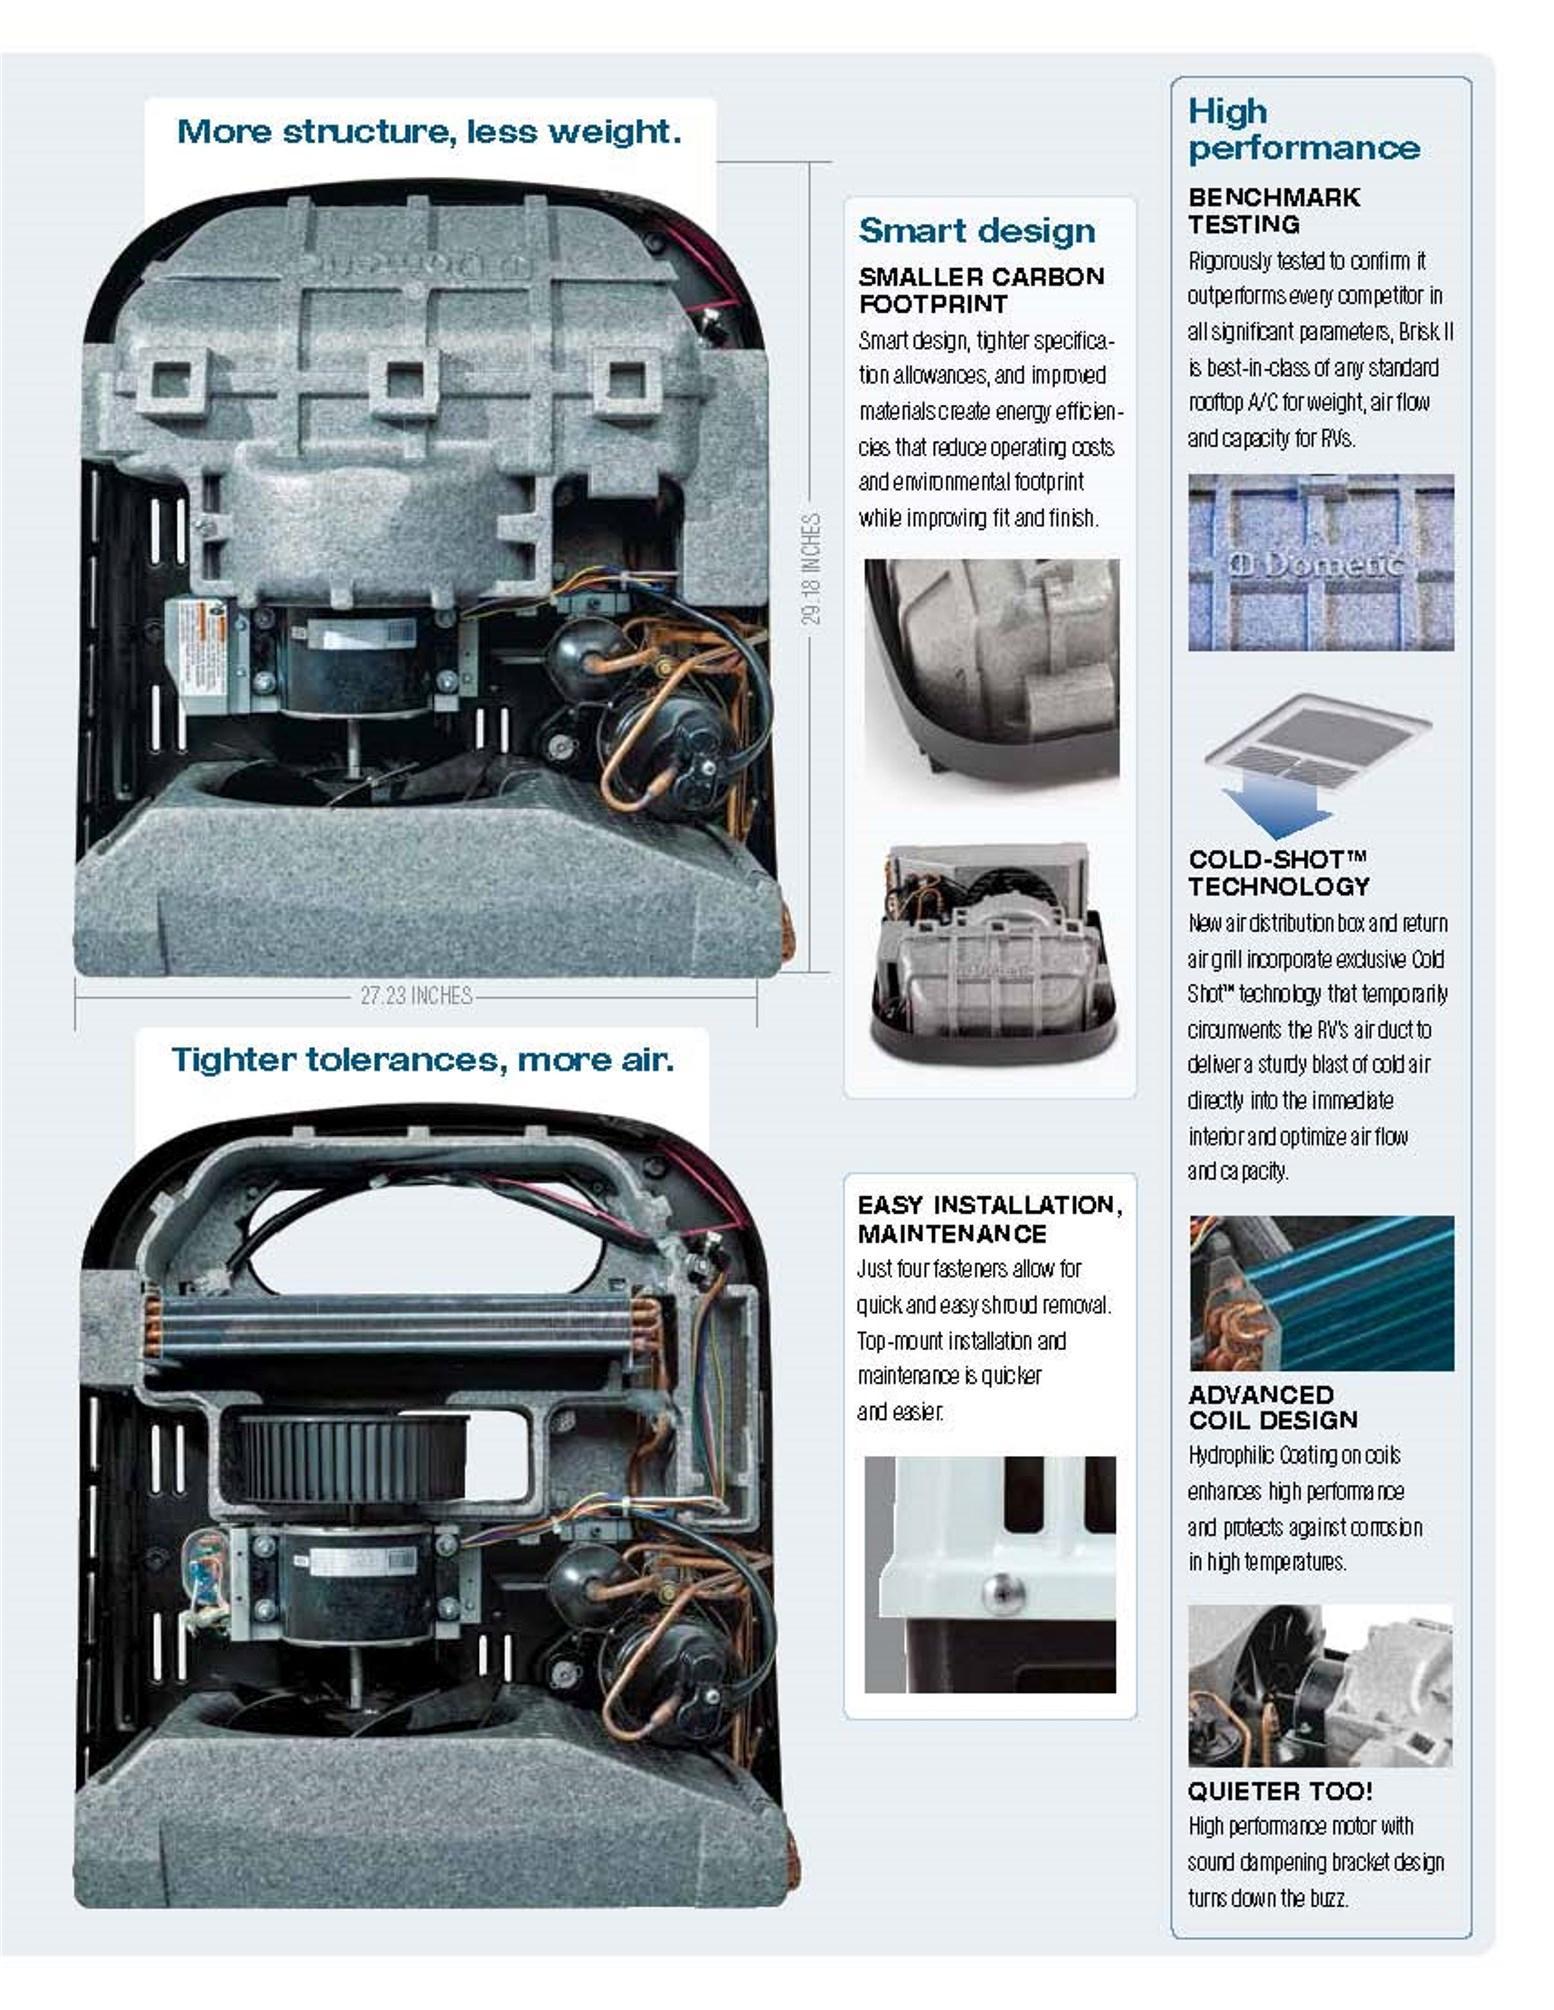 Dometic Polar White 15,000 BTU Conditioners B59516 XX1C0 Brisk Air Ii 15 0  Pw Upper Unit